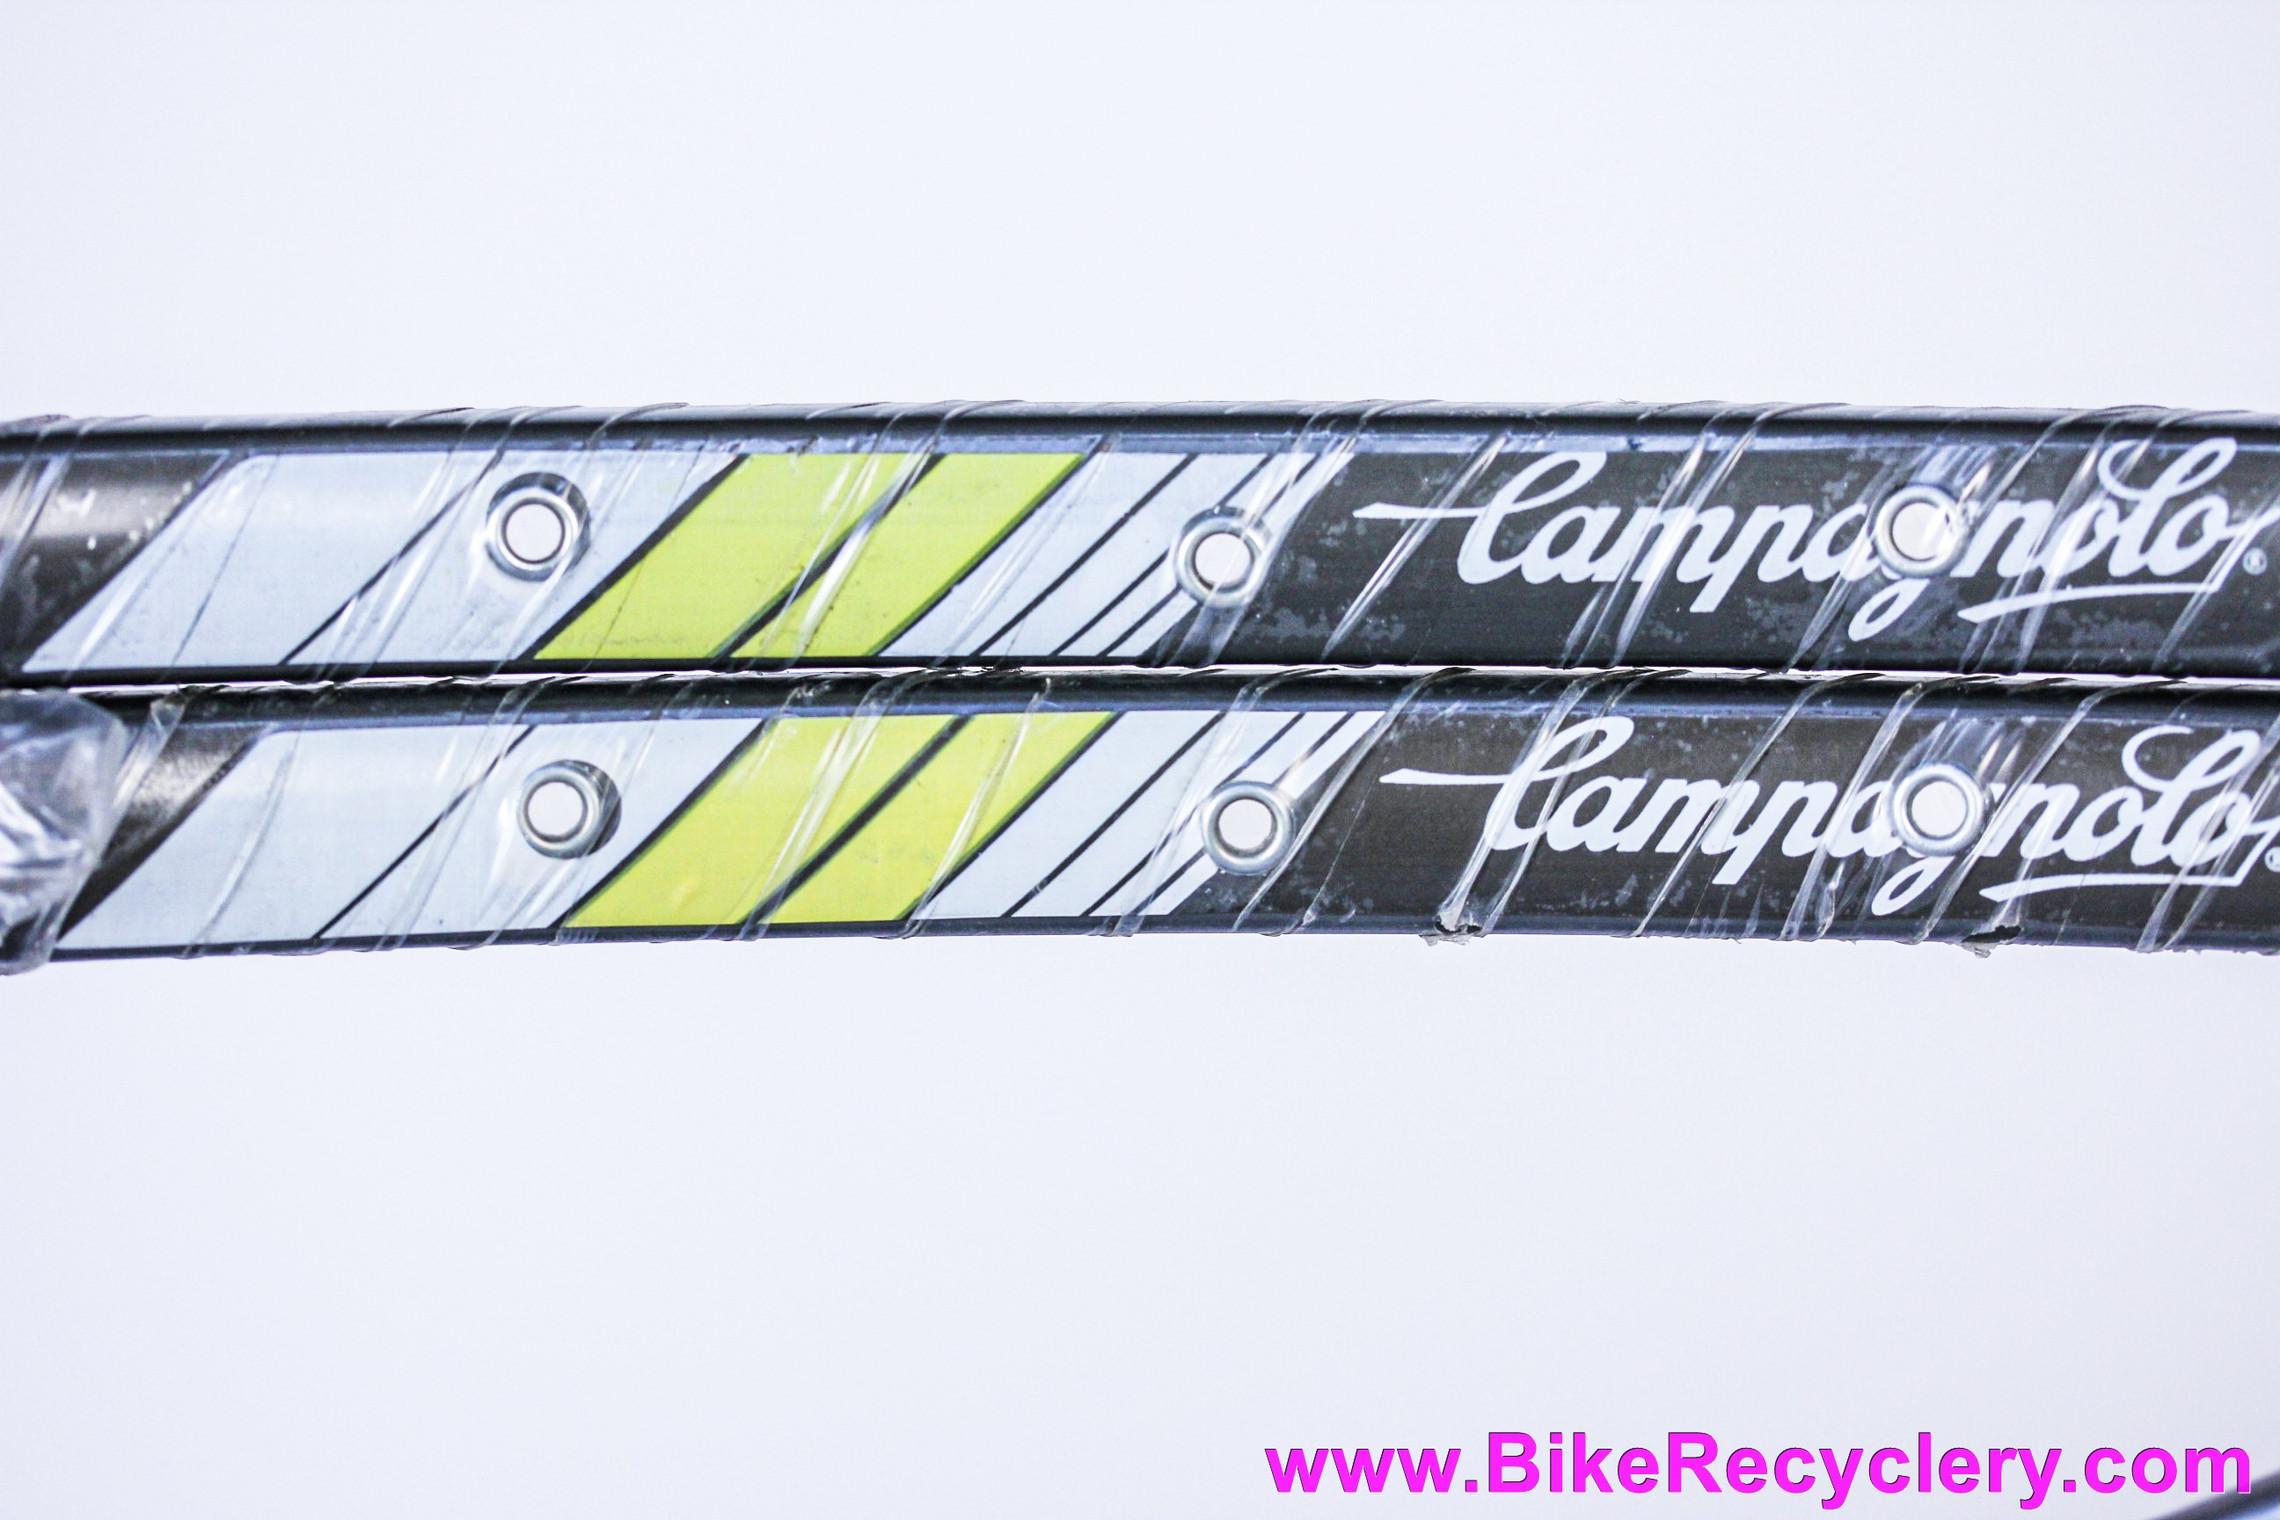 NIB/NOS Campagnolo Omega Strada Hardox Tubular Rims: PAIR - 32H - Vintage Early 1990's